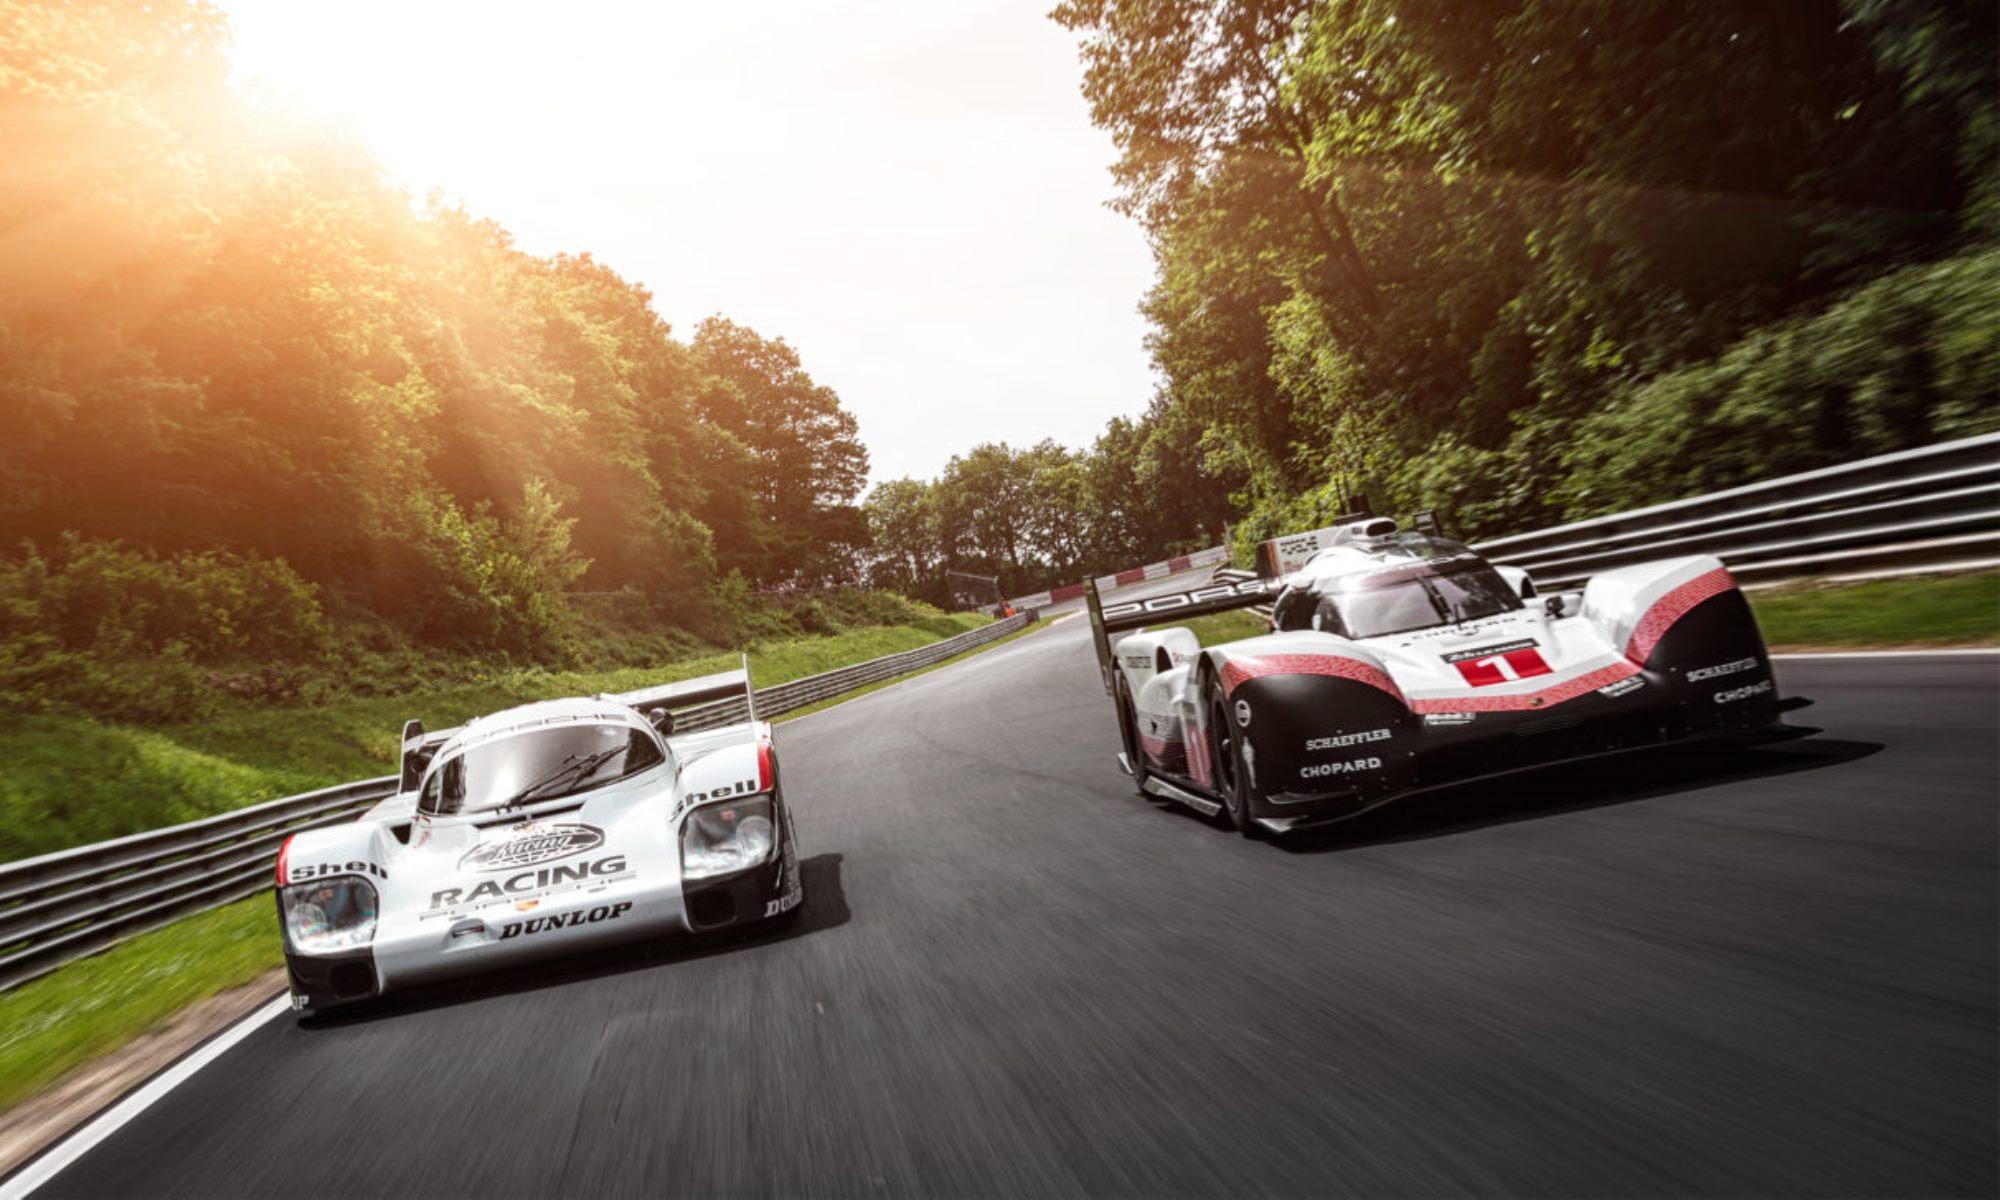 Porsche 956 and Porsche 919 at Nurburgring